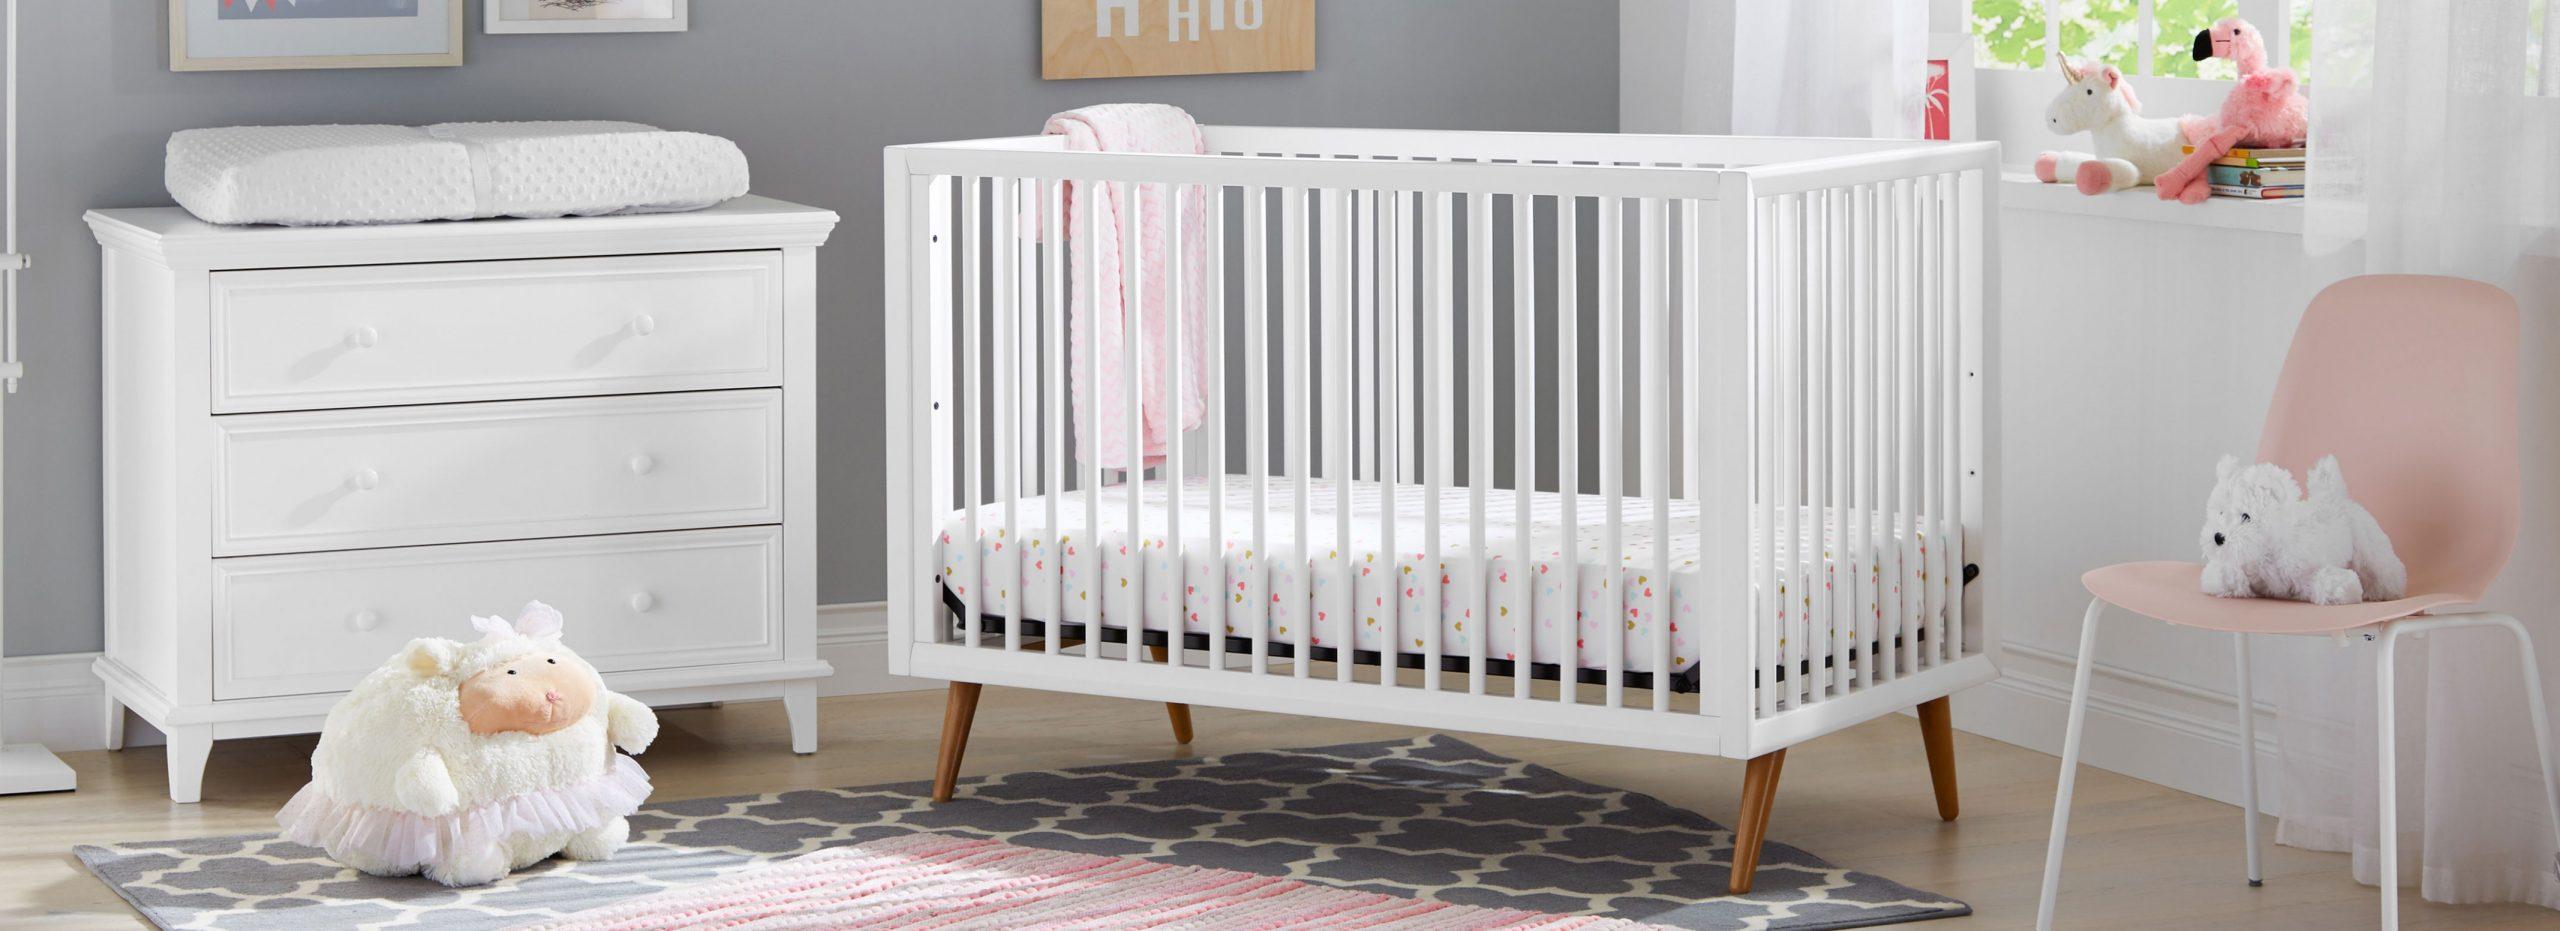 Nursery Furniture  Baby Furniture  Nursery Sets  Kolcraft - Baby Room Furniture